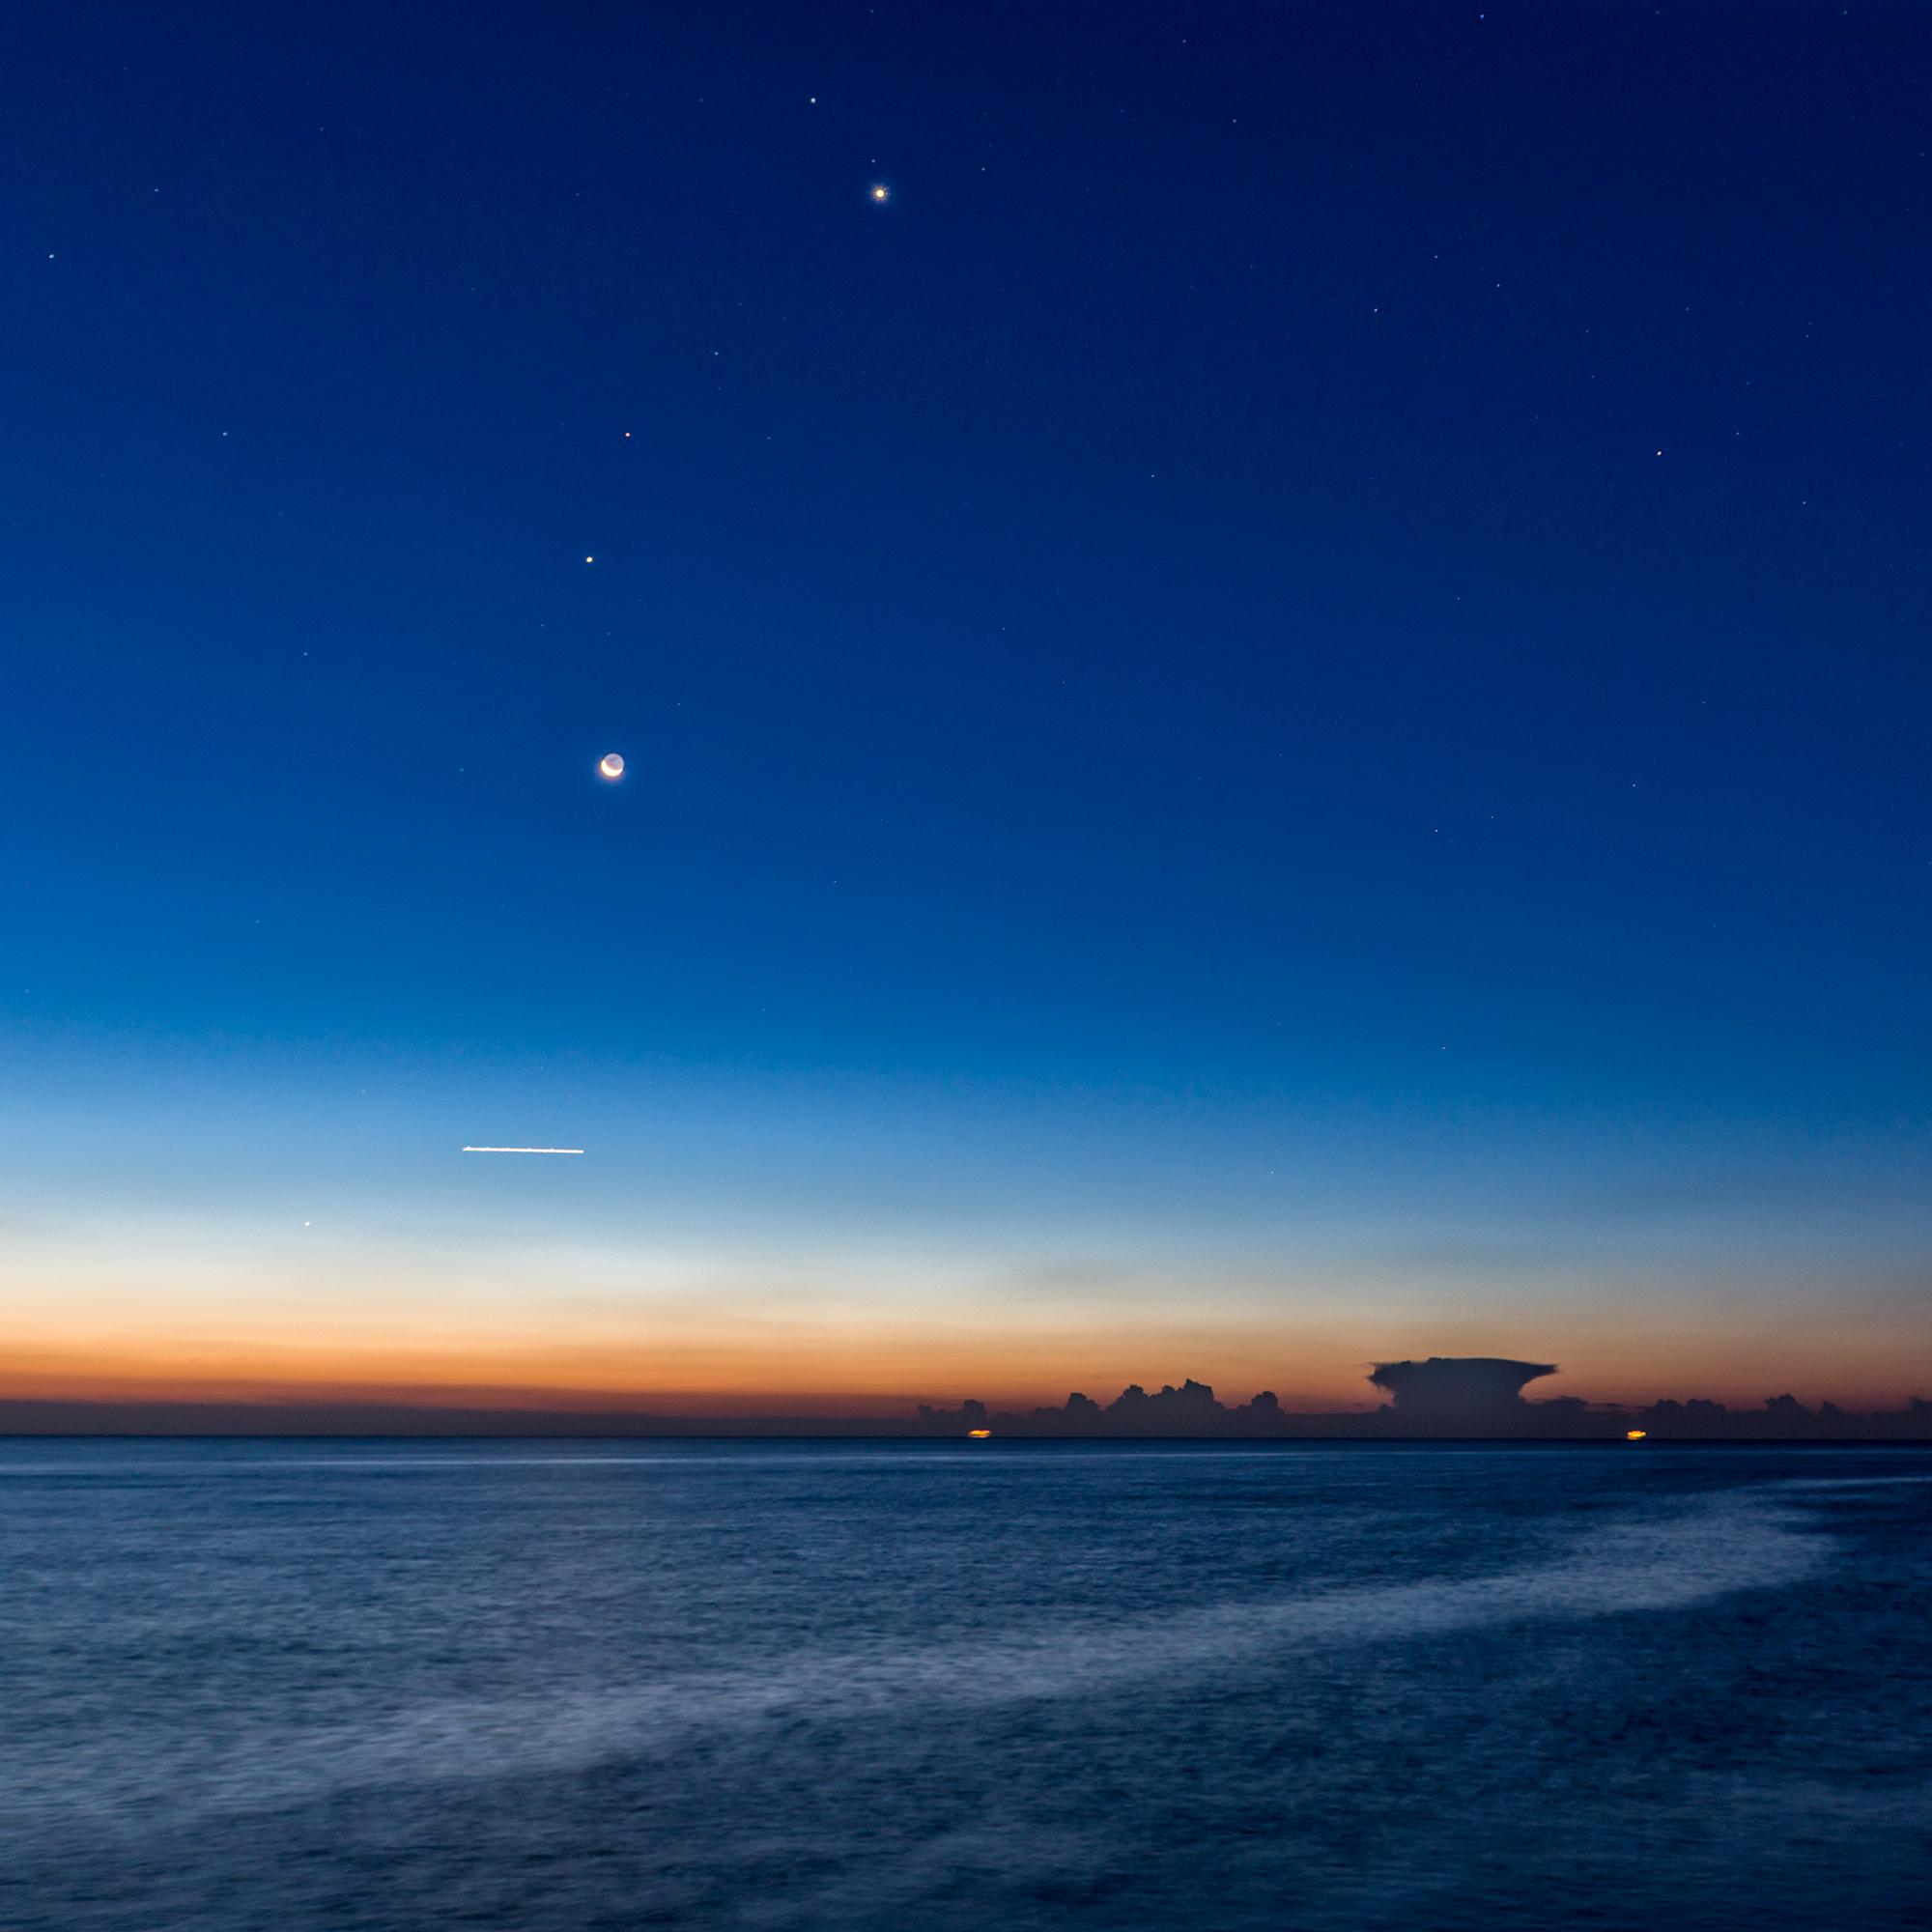 Venus, Crescent Moon, Plane, and Boats. Barcelona, 2015